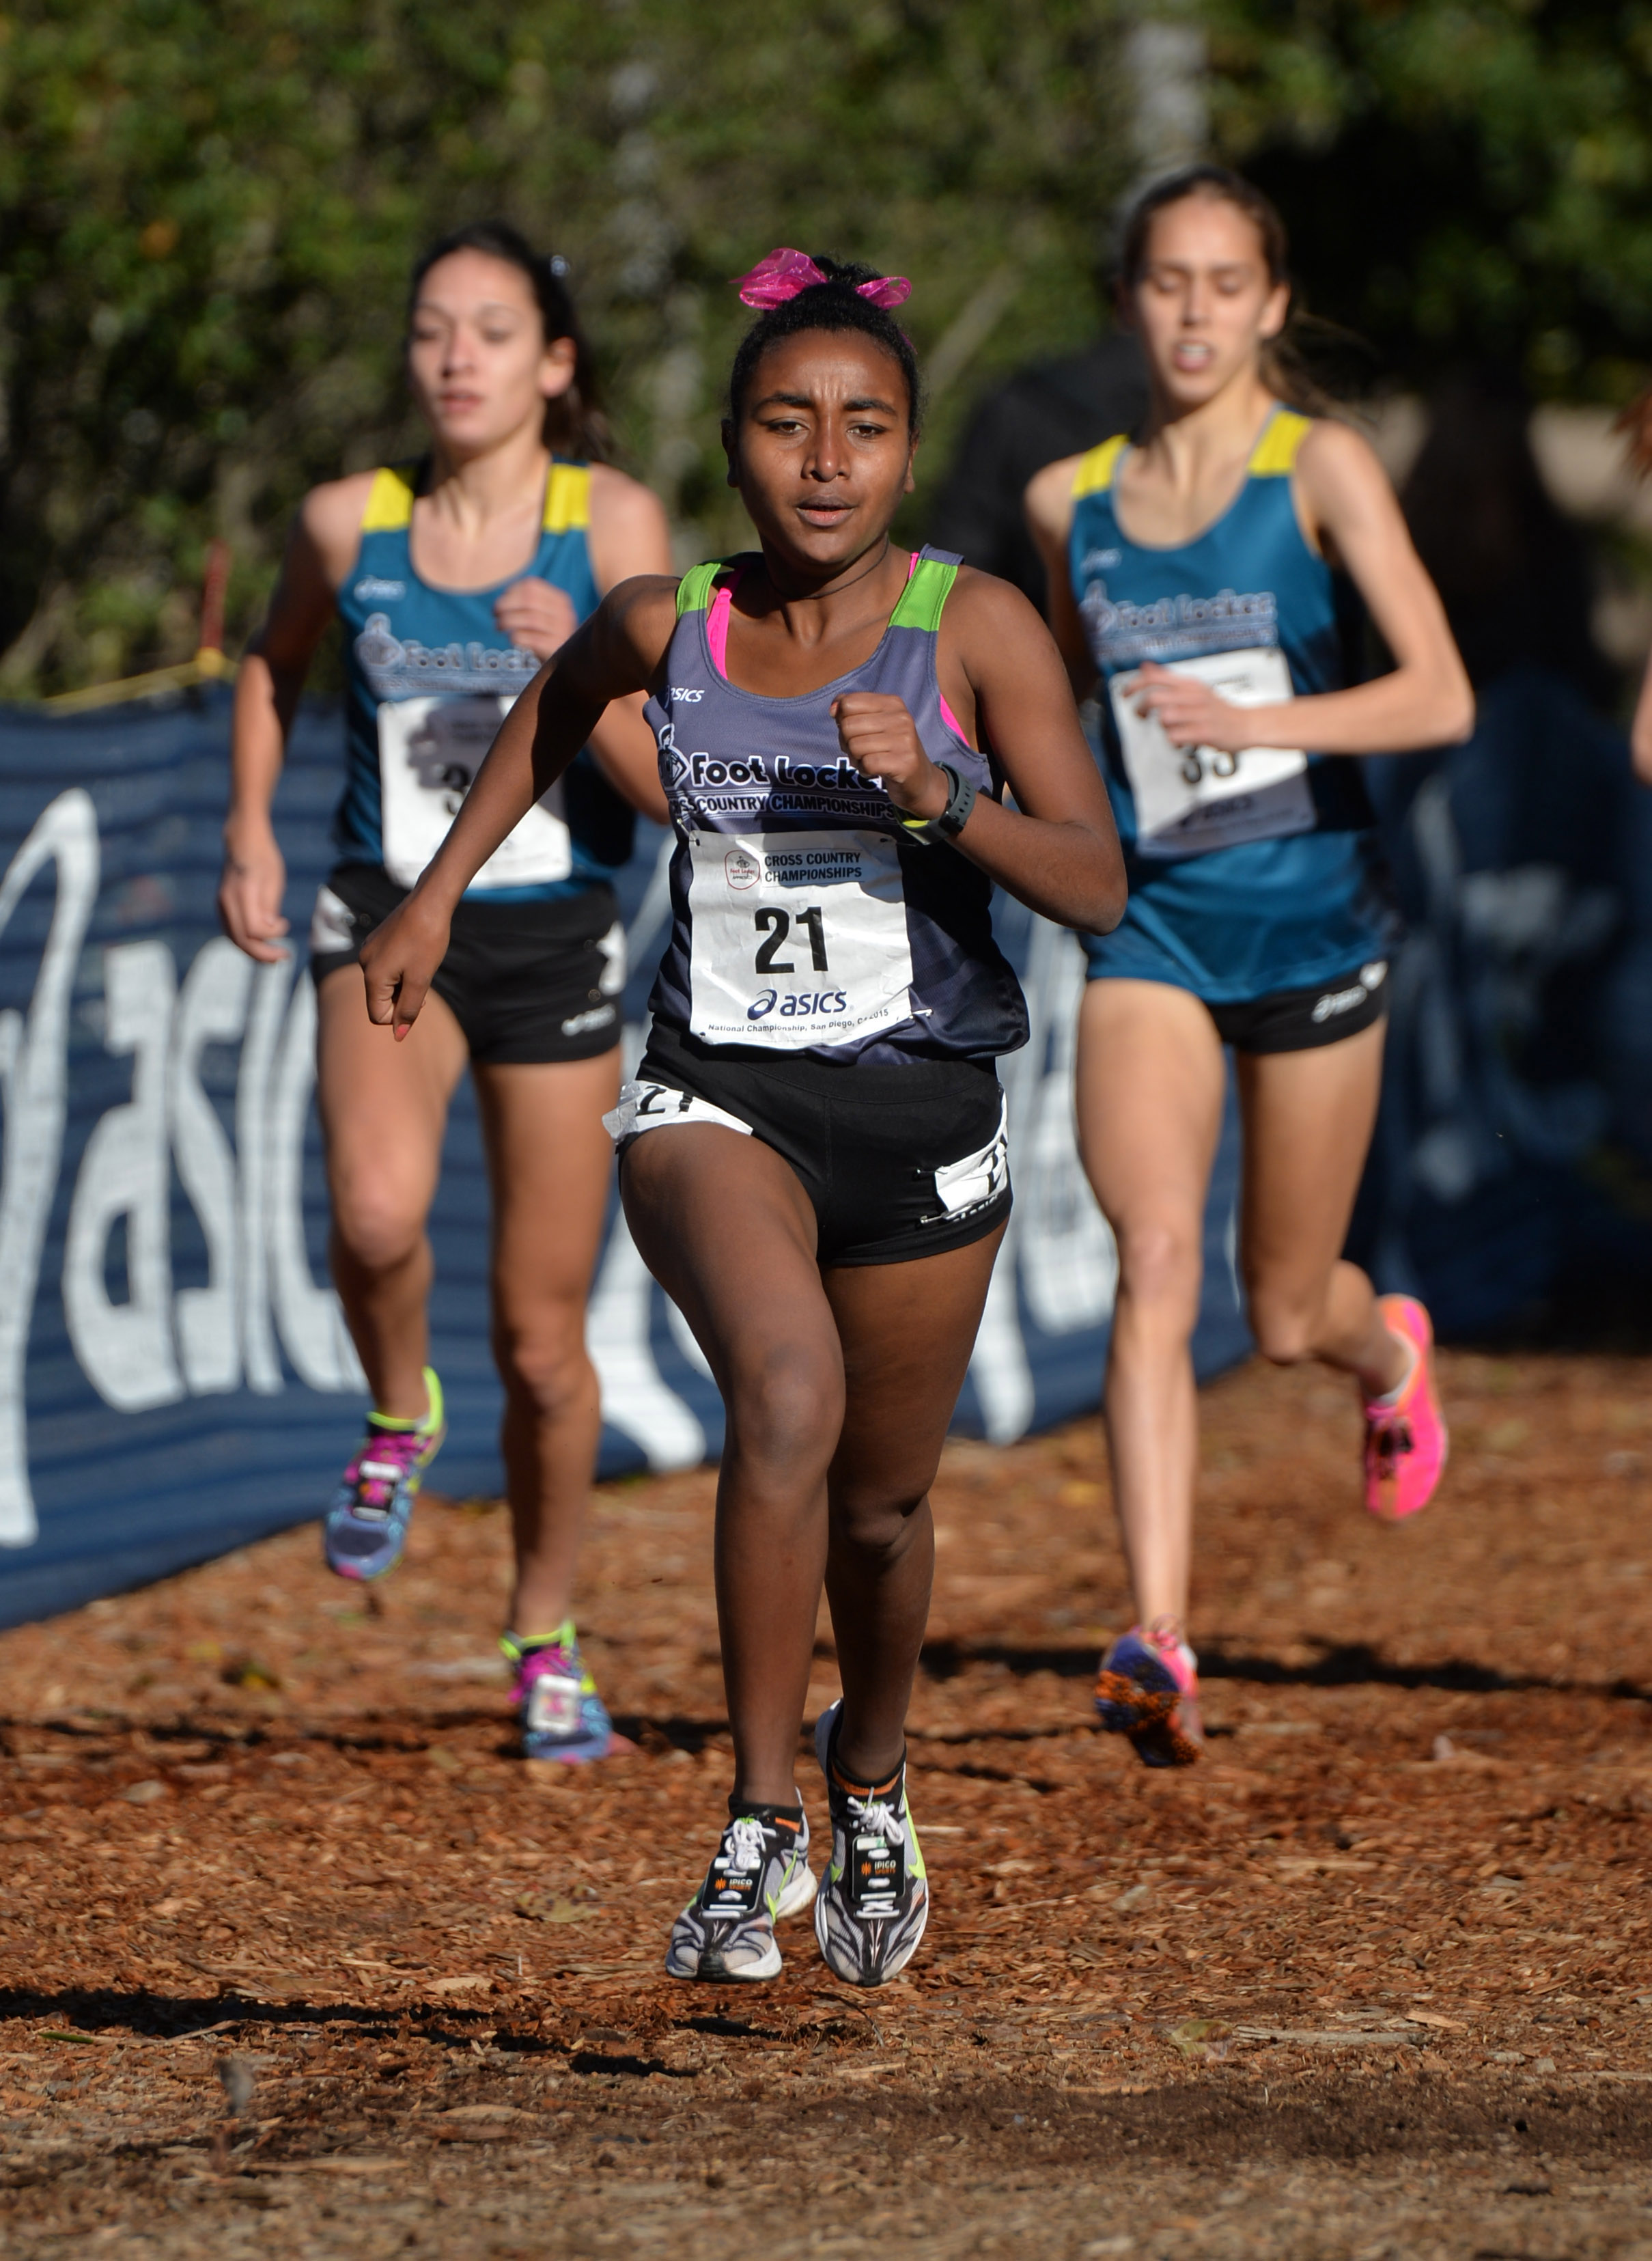 Weini Kelati of Heritage High (Va.) wins the girls race in 17:09. Photo: Kirby Lee, USA TODAY Sports)